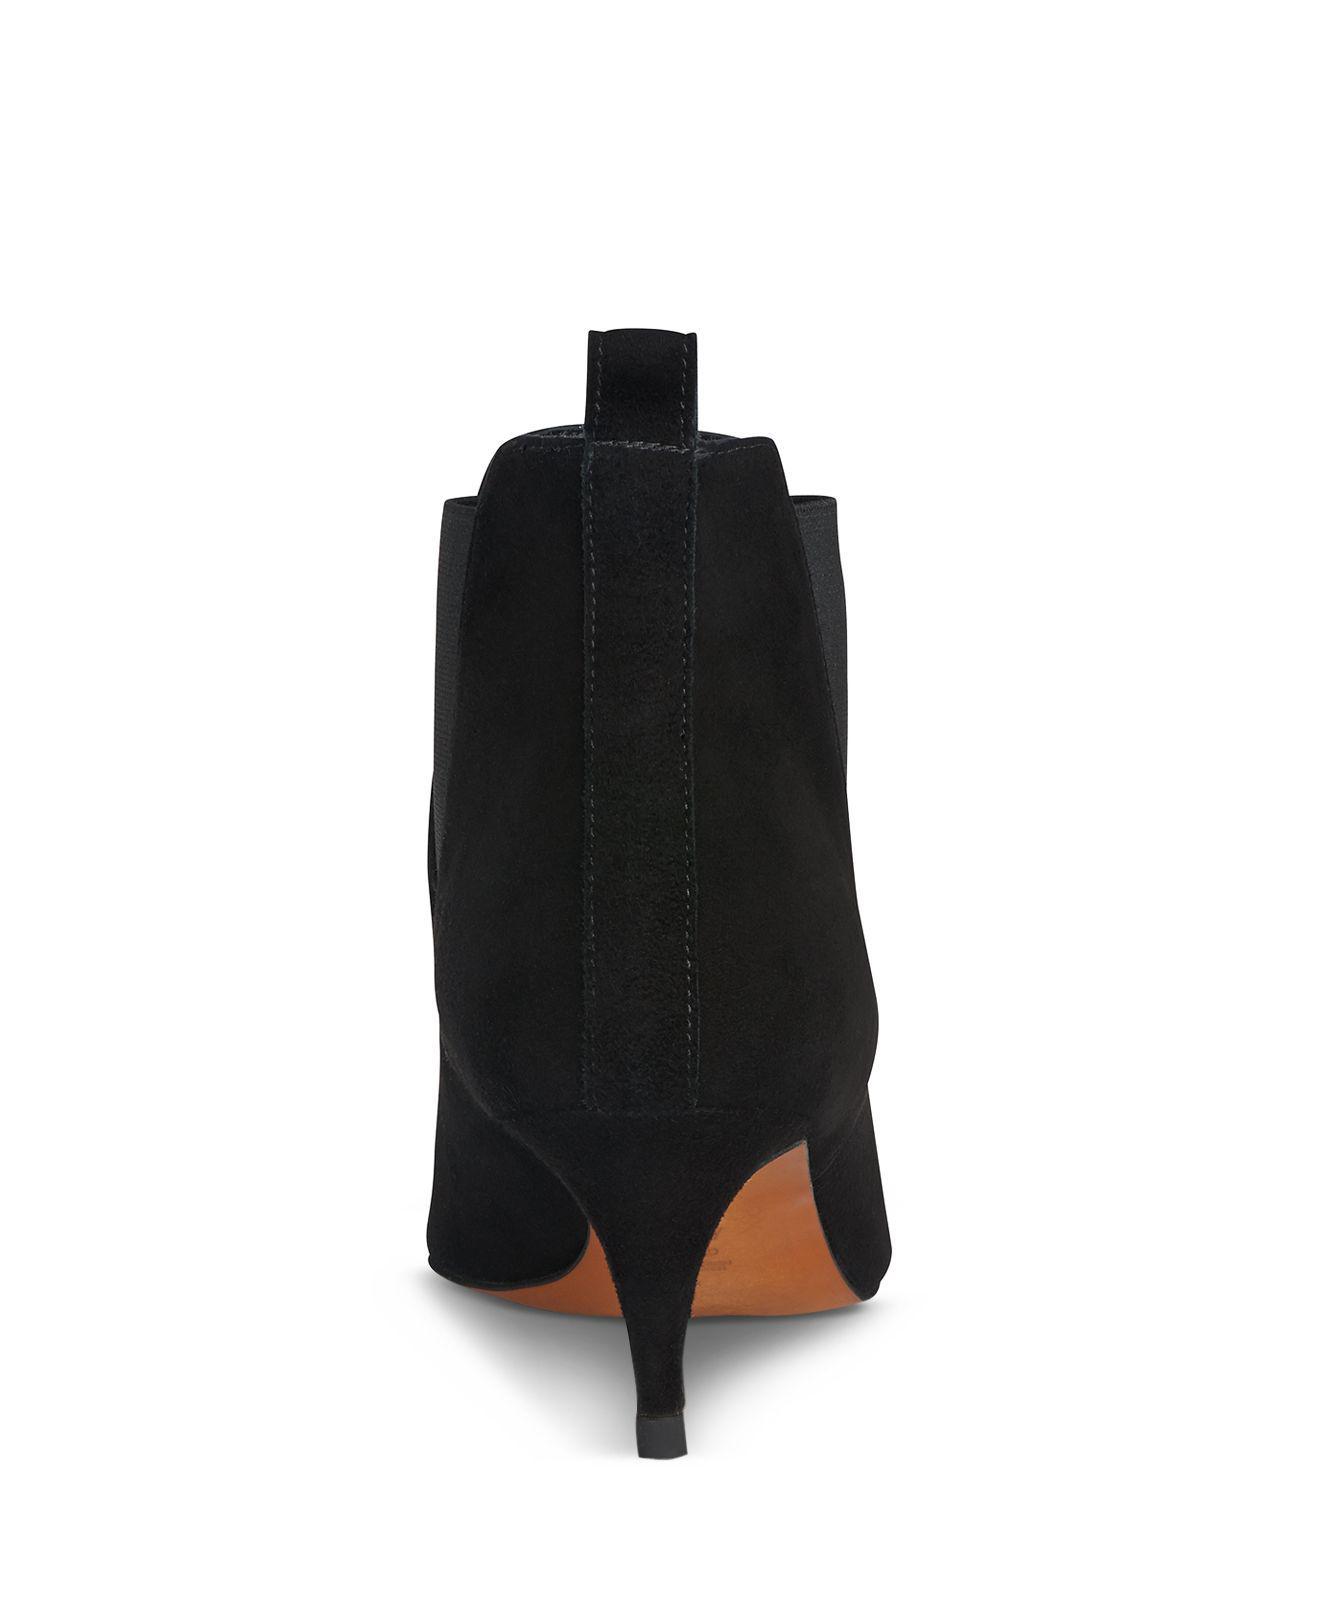 fdf1effe9918 Whistles Women s Orley Suede Kitten Heel Booties in Black - Lyst